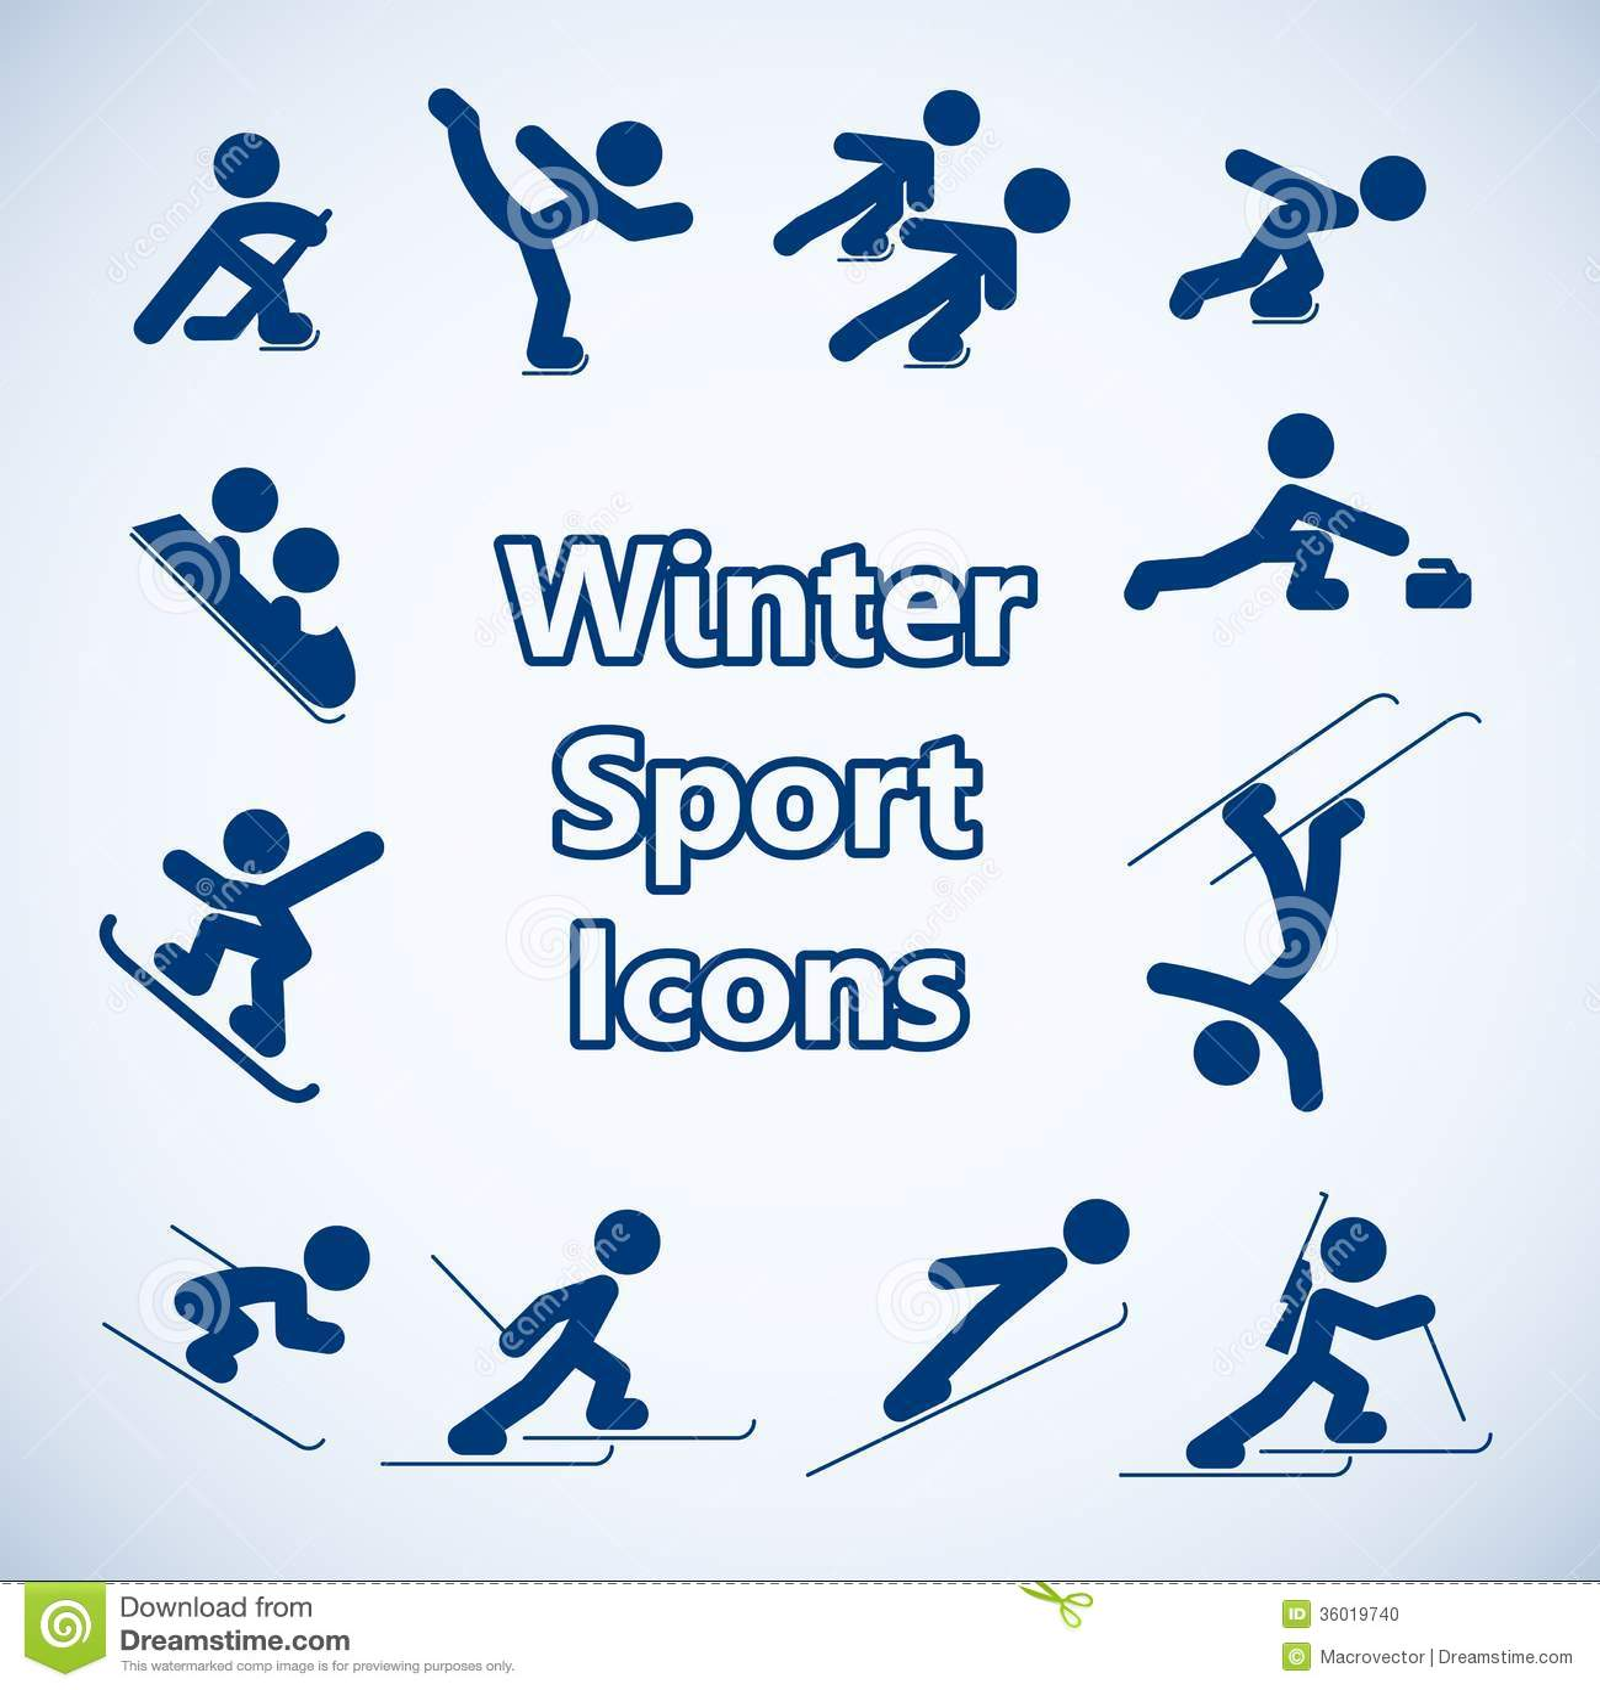 Winter Sports Icons Set Stock Photo - Image: 36019740